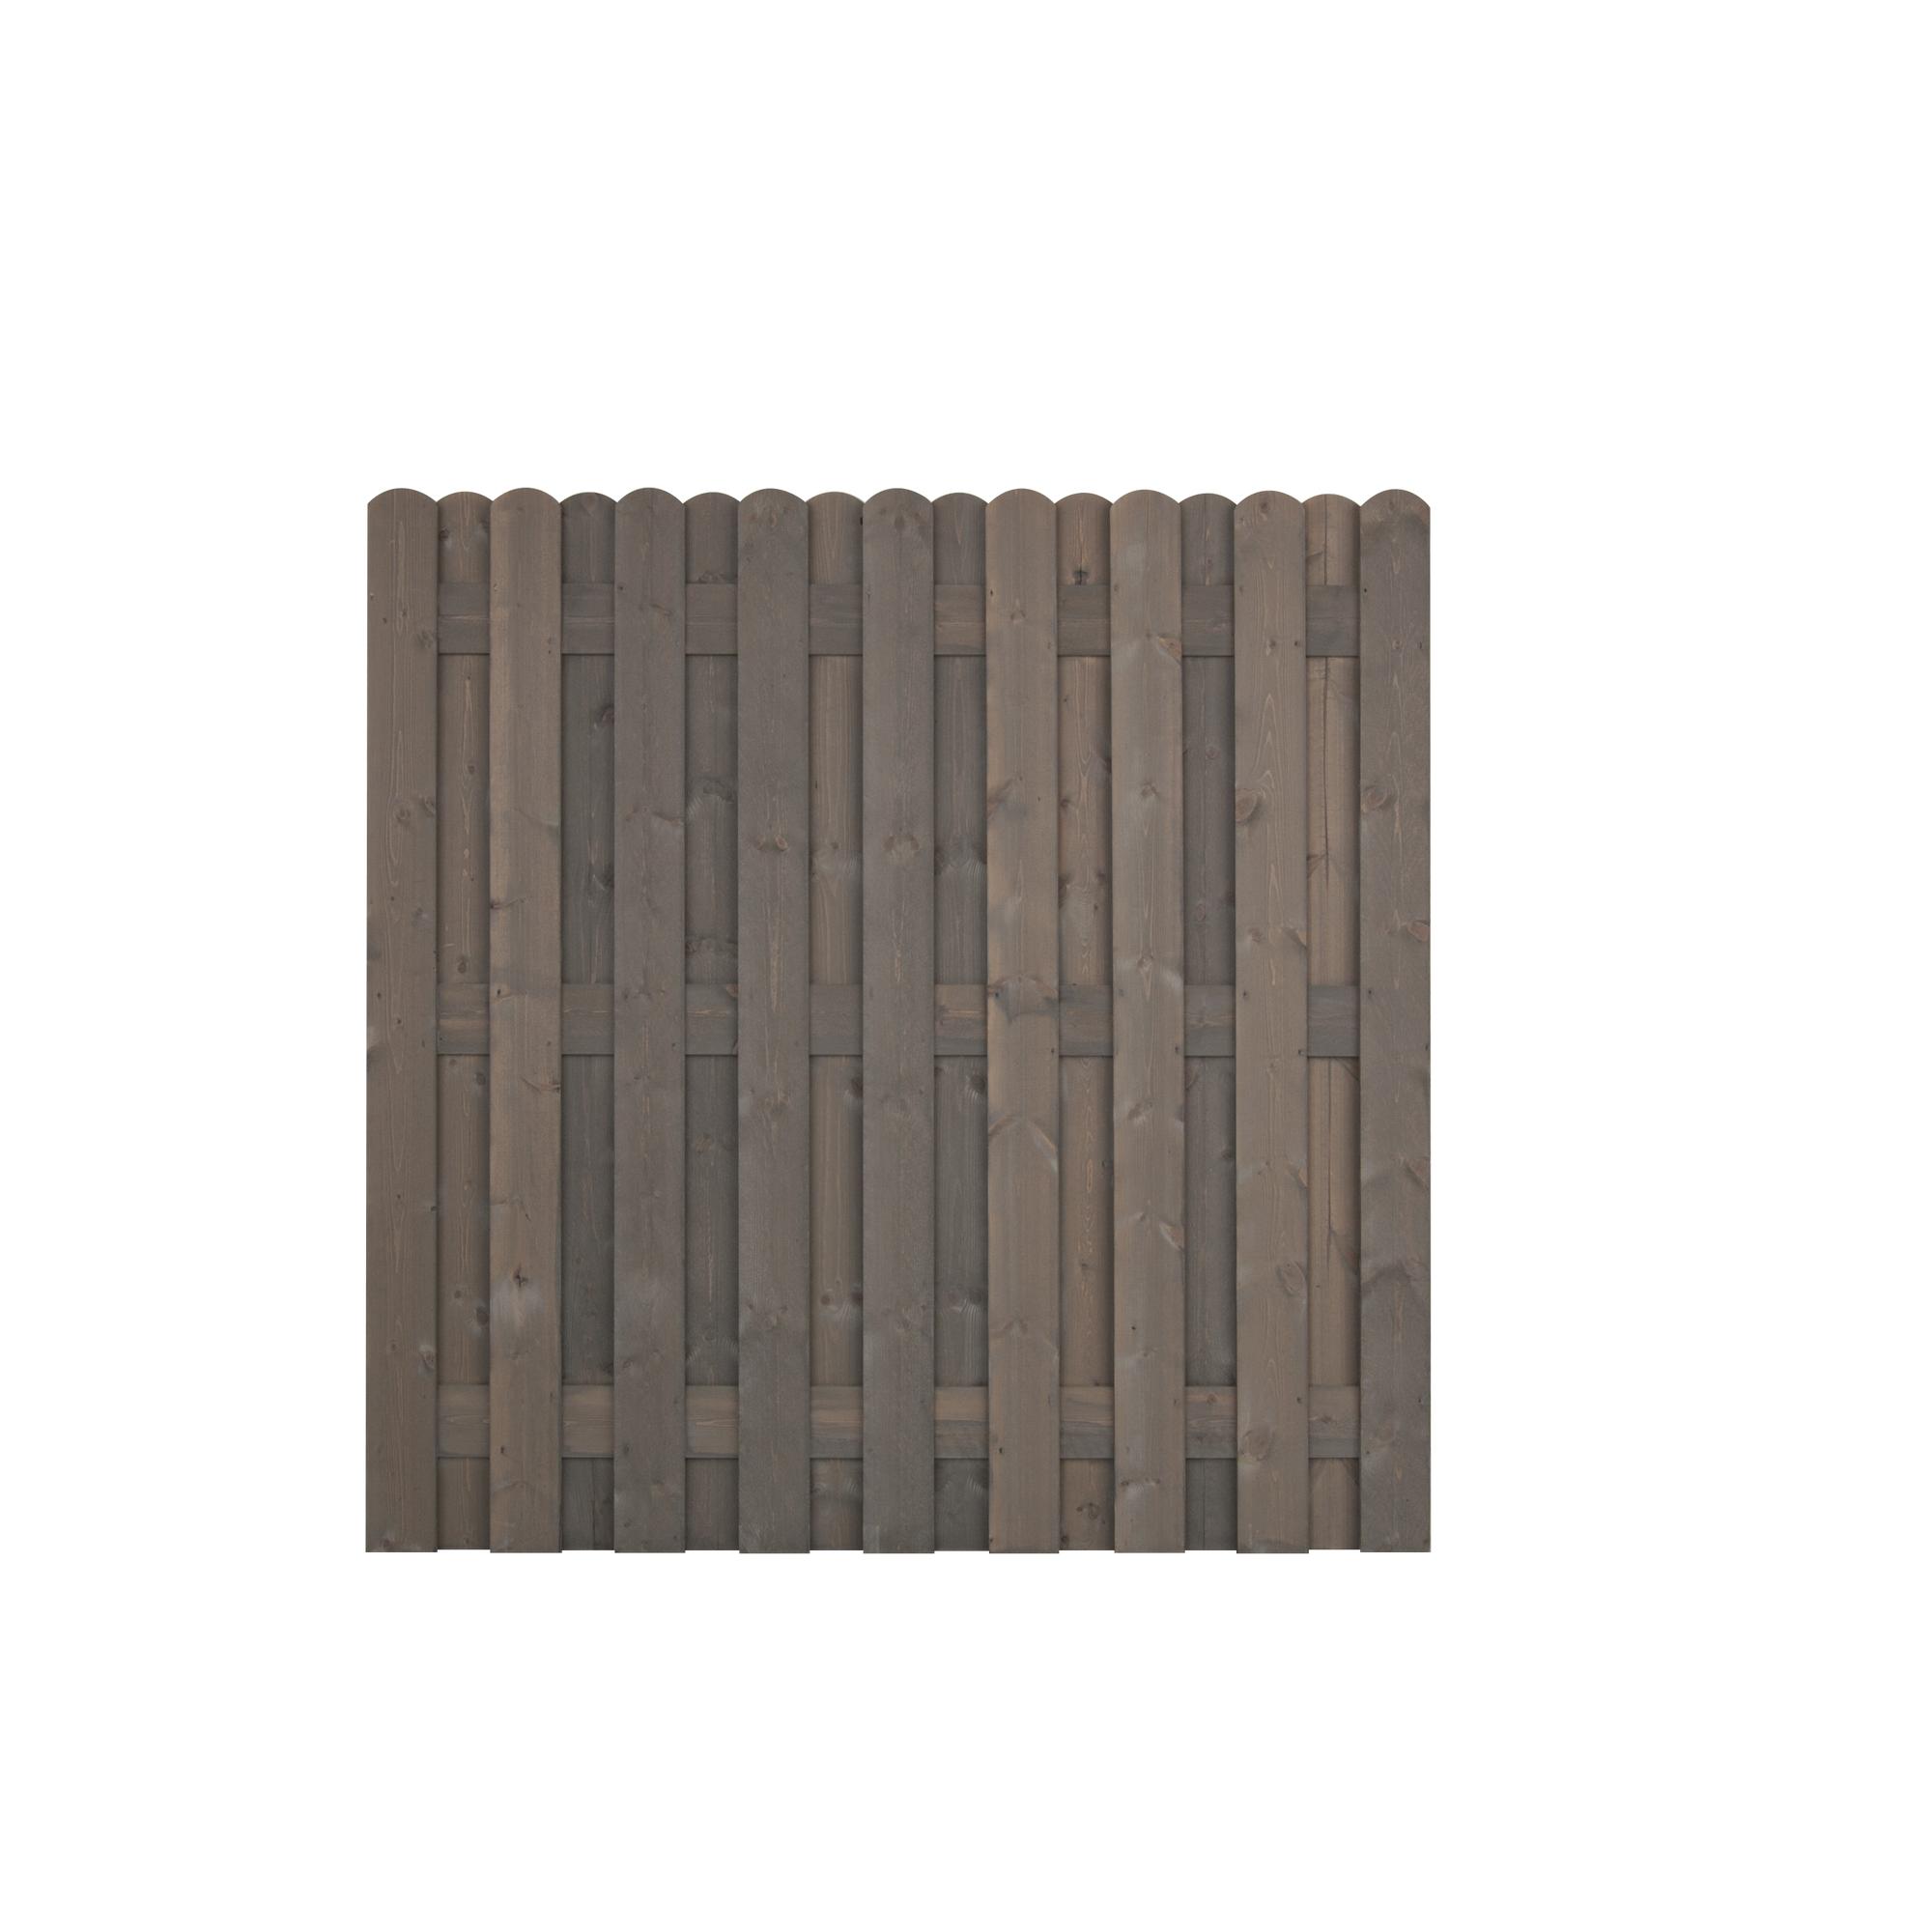 Zaunelement Bohlenzaun Grau 180 X 180 Cm ǀ Toom Baumarkt